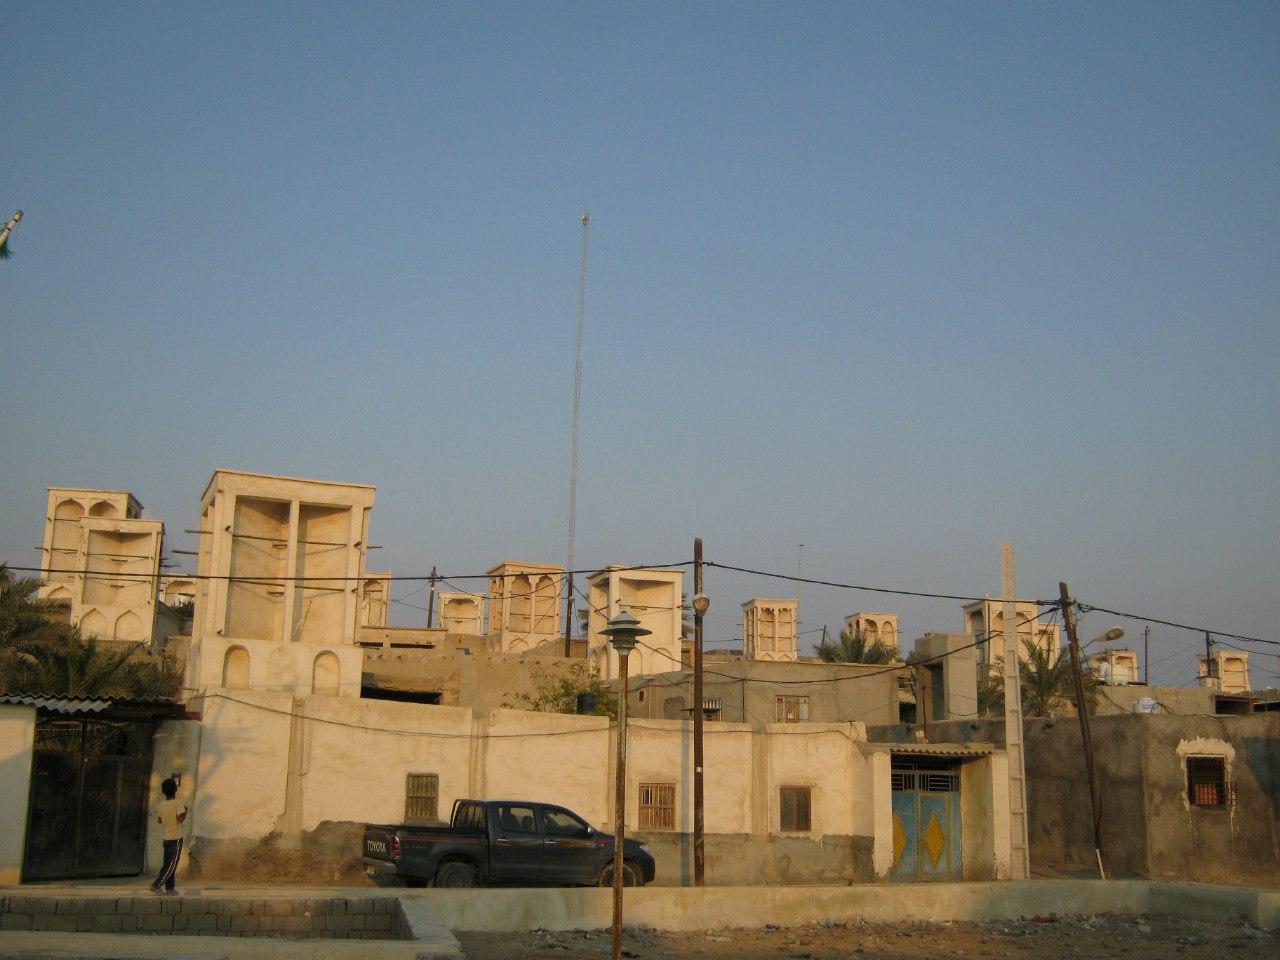 а село Бандер Лафт с бадгирами (ветроуловителями)